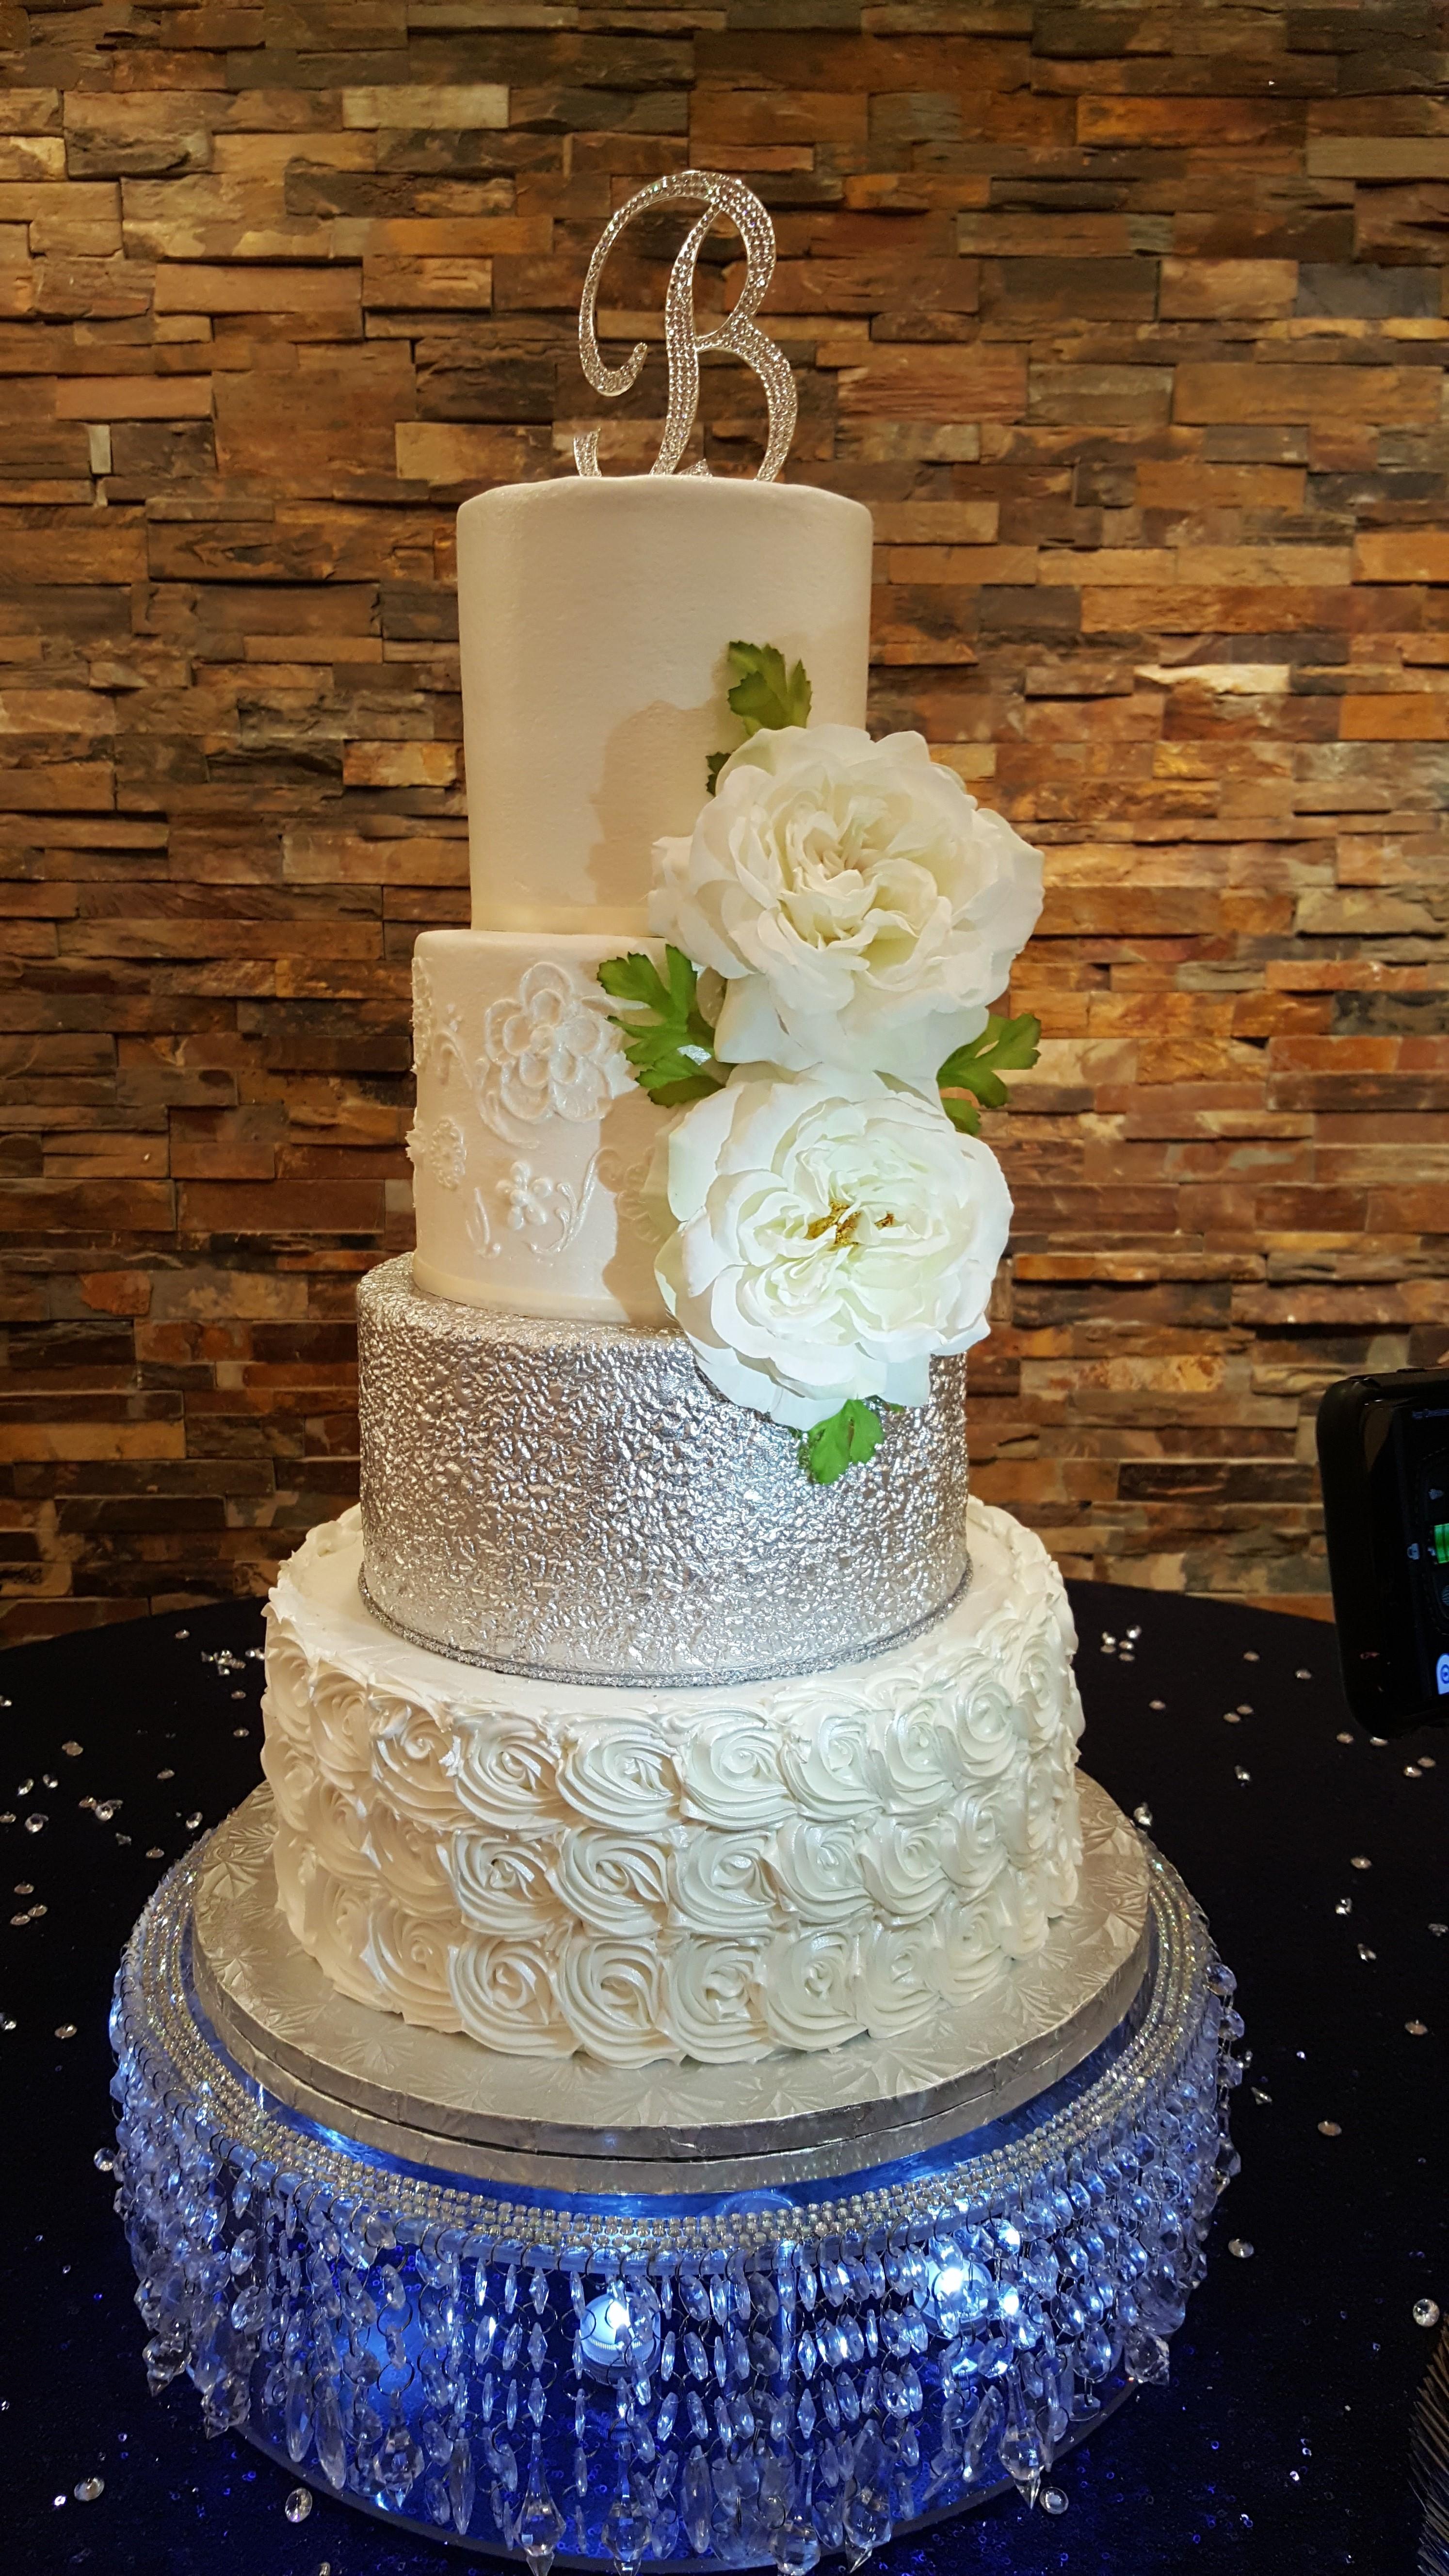 Wedding Cakes by Tammy Allen image 15